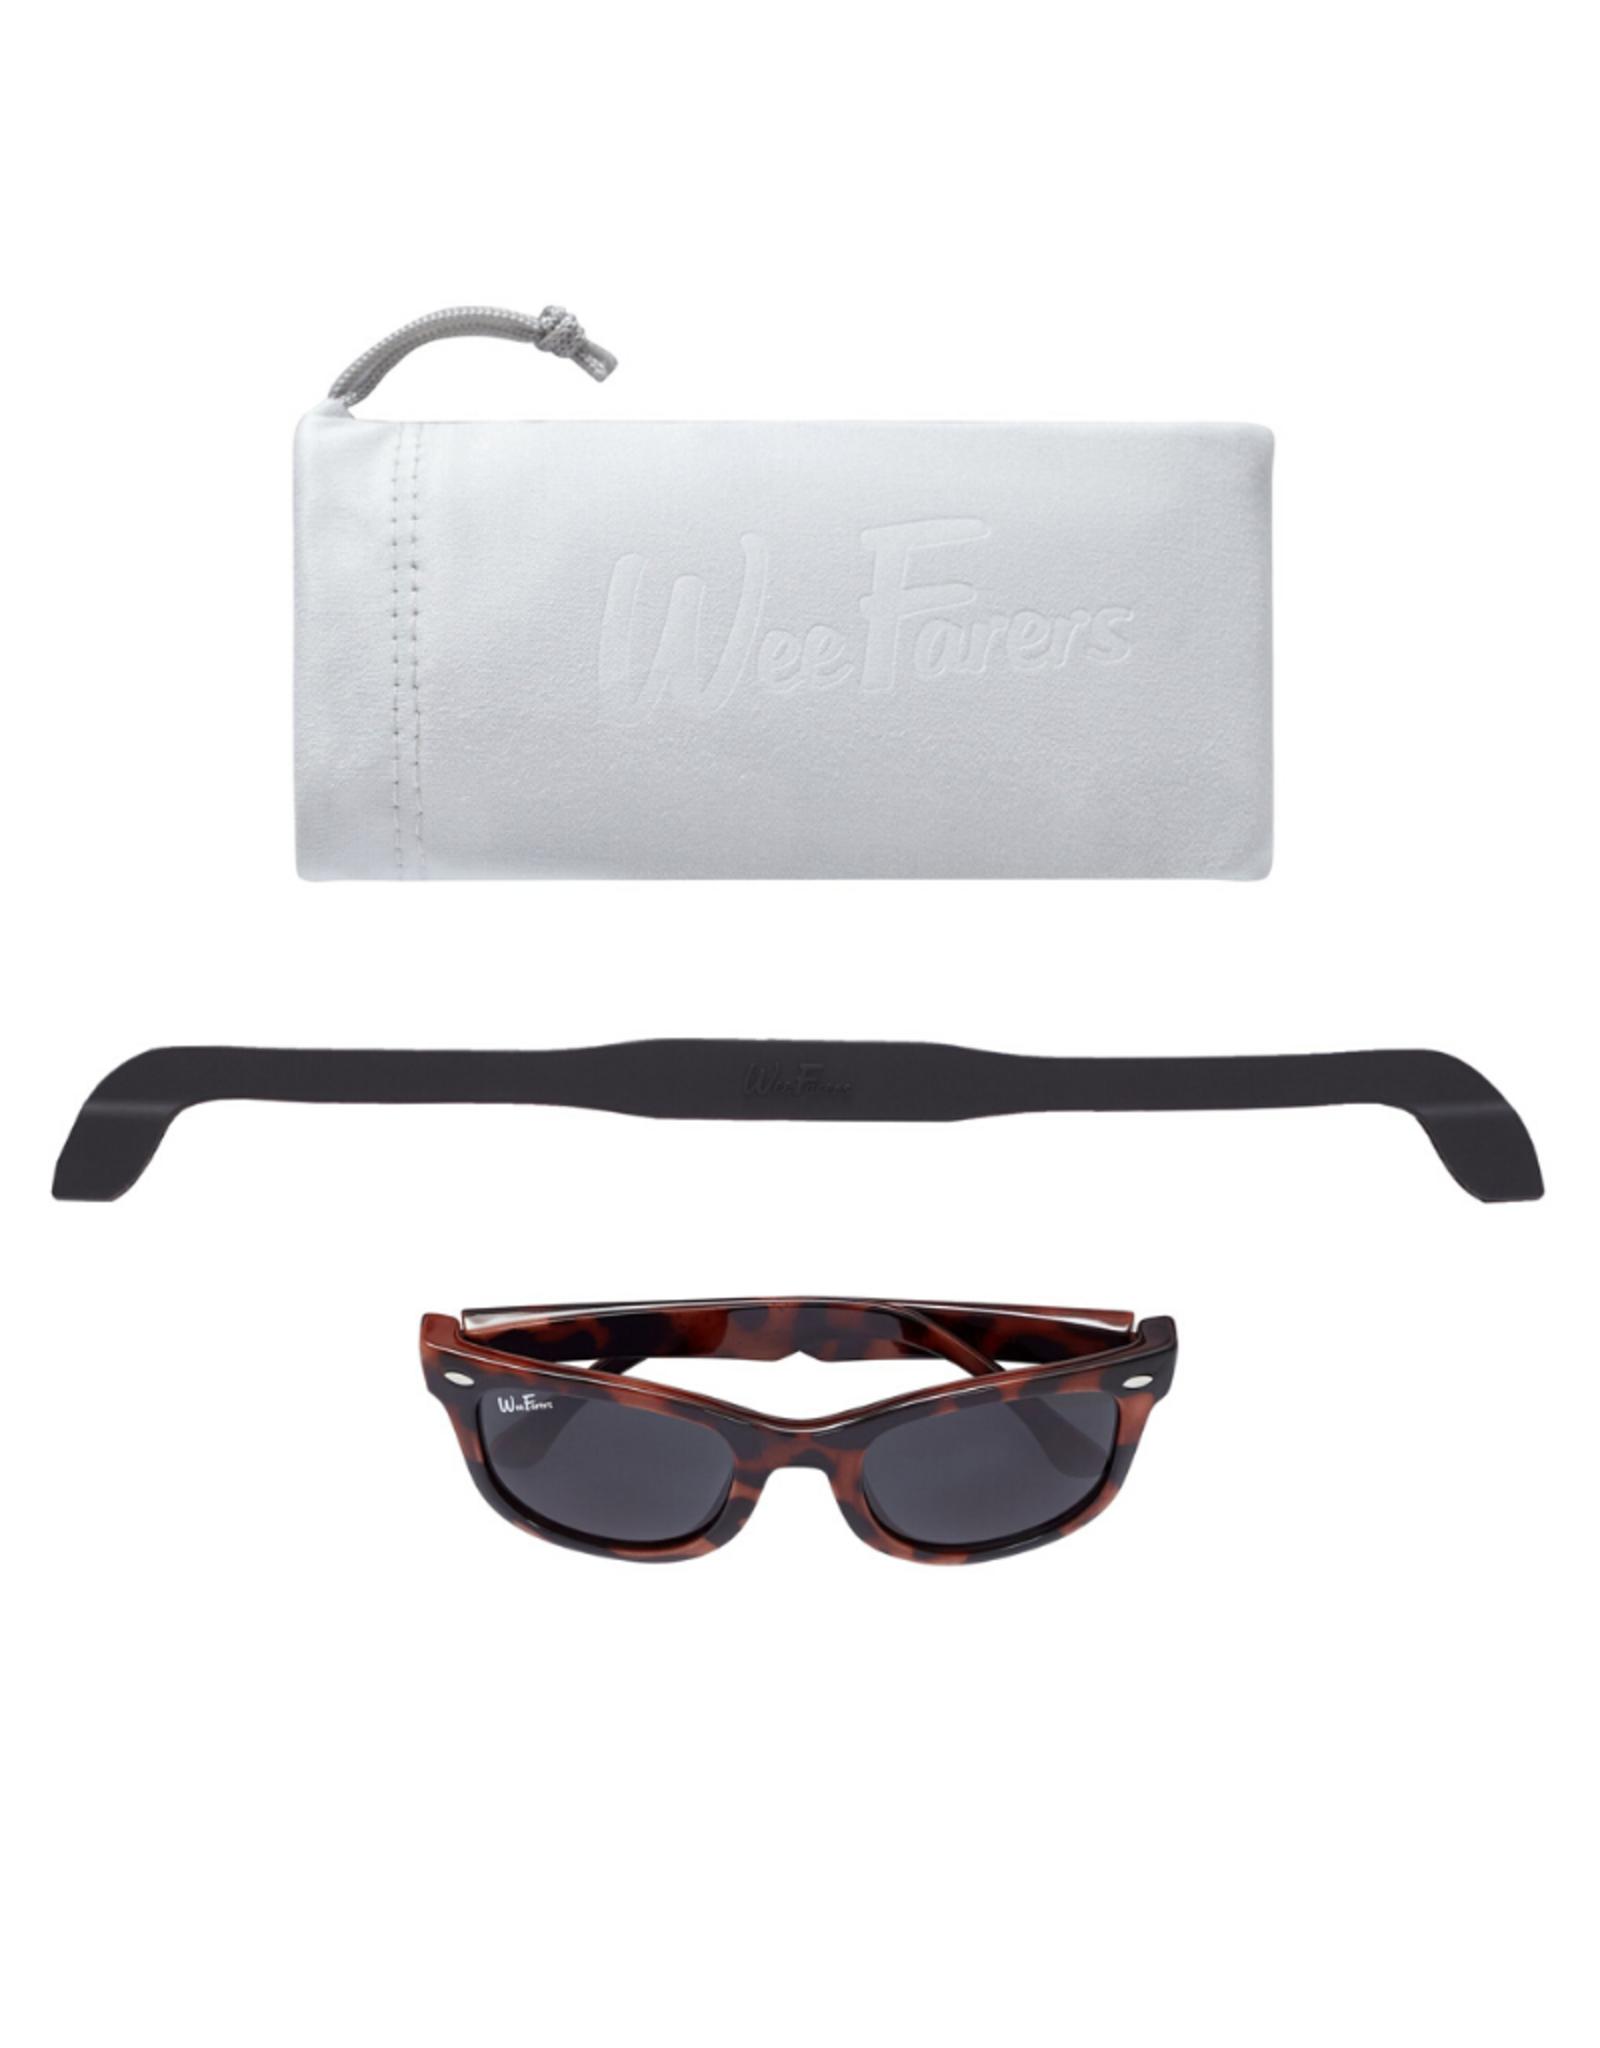 WeeFarers Tortoise Shell Sunglasses